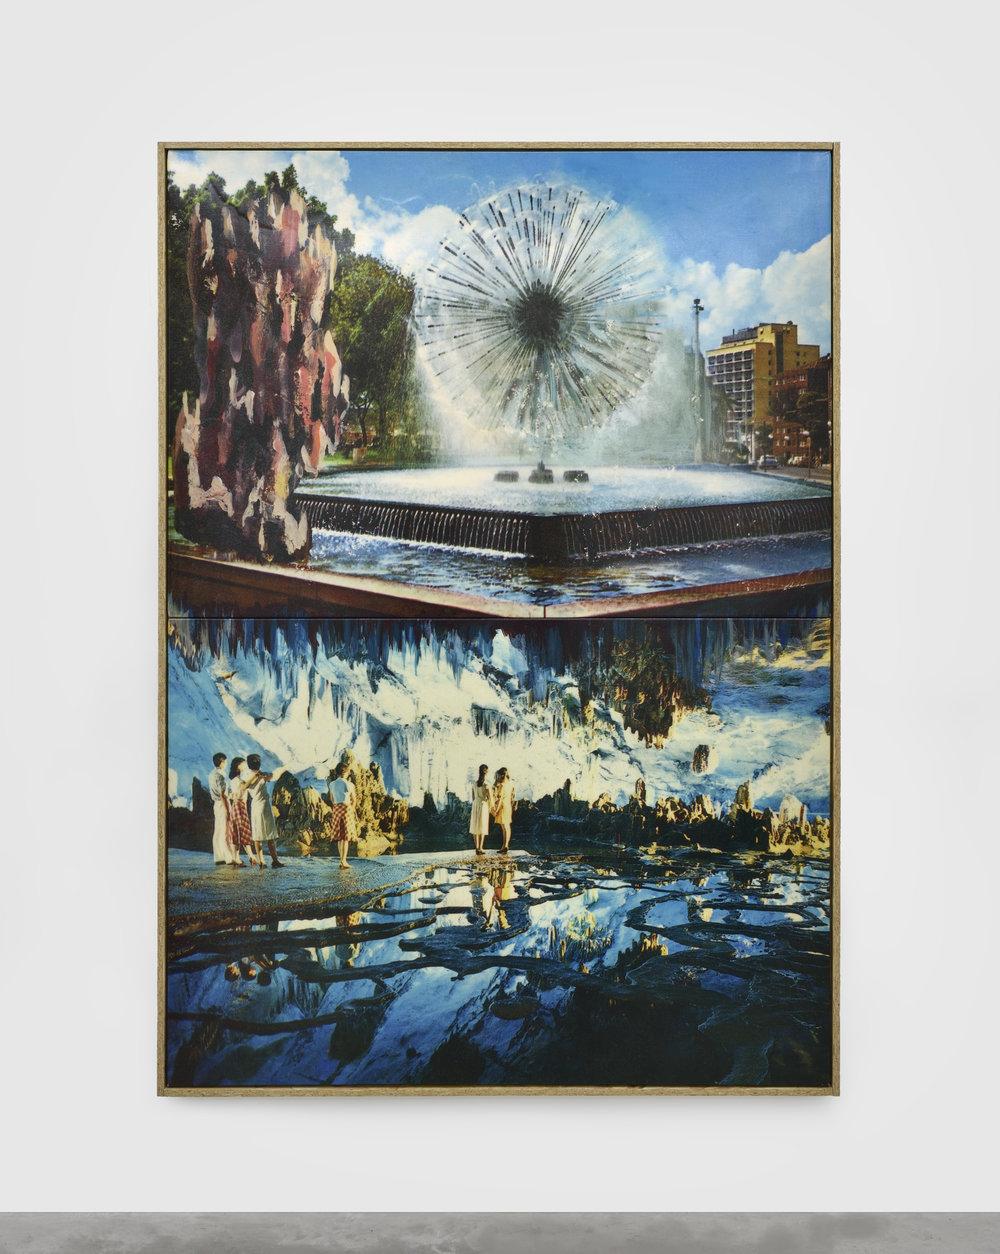 La vision , 2016 print on canvas, resin, glitter 176 x 234 cm - 69 9/32 x 92 1/8 in